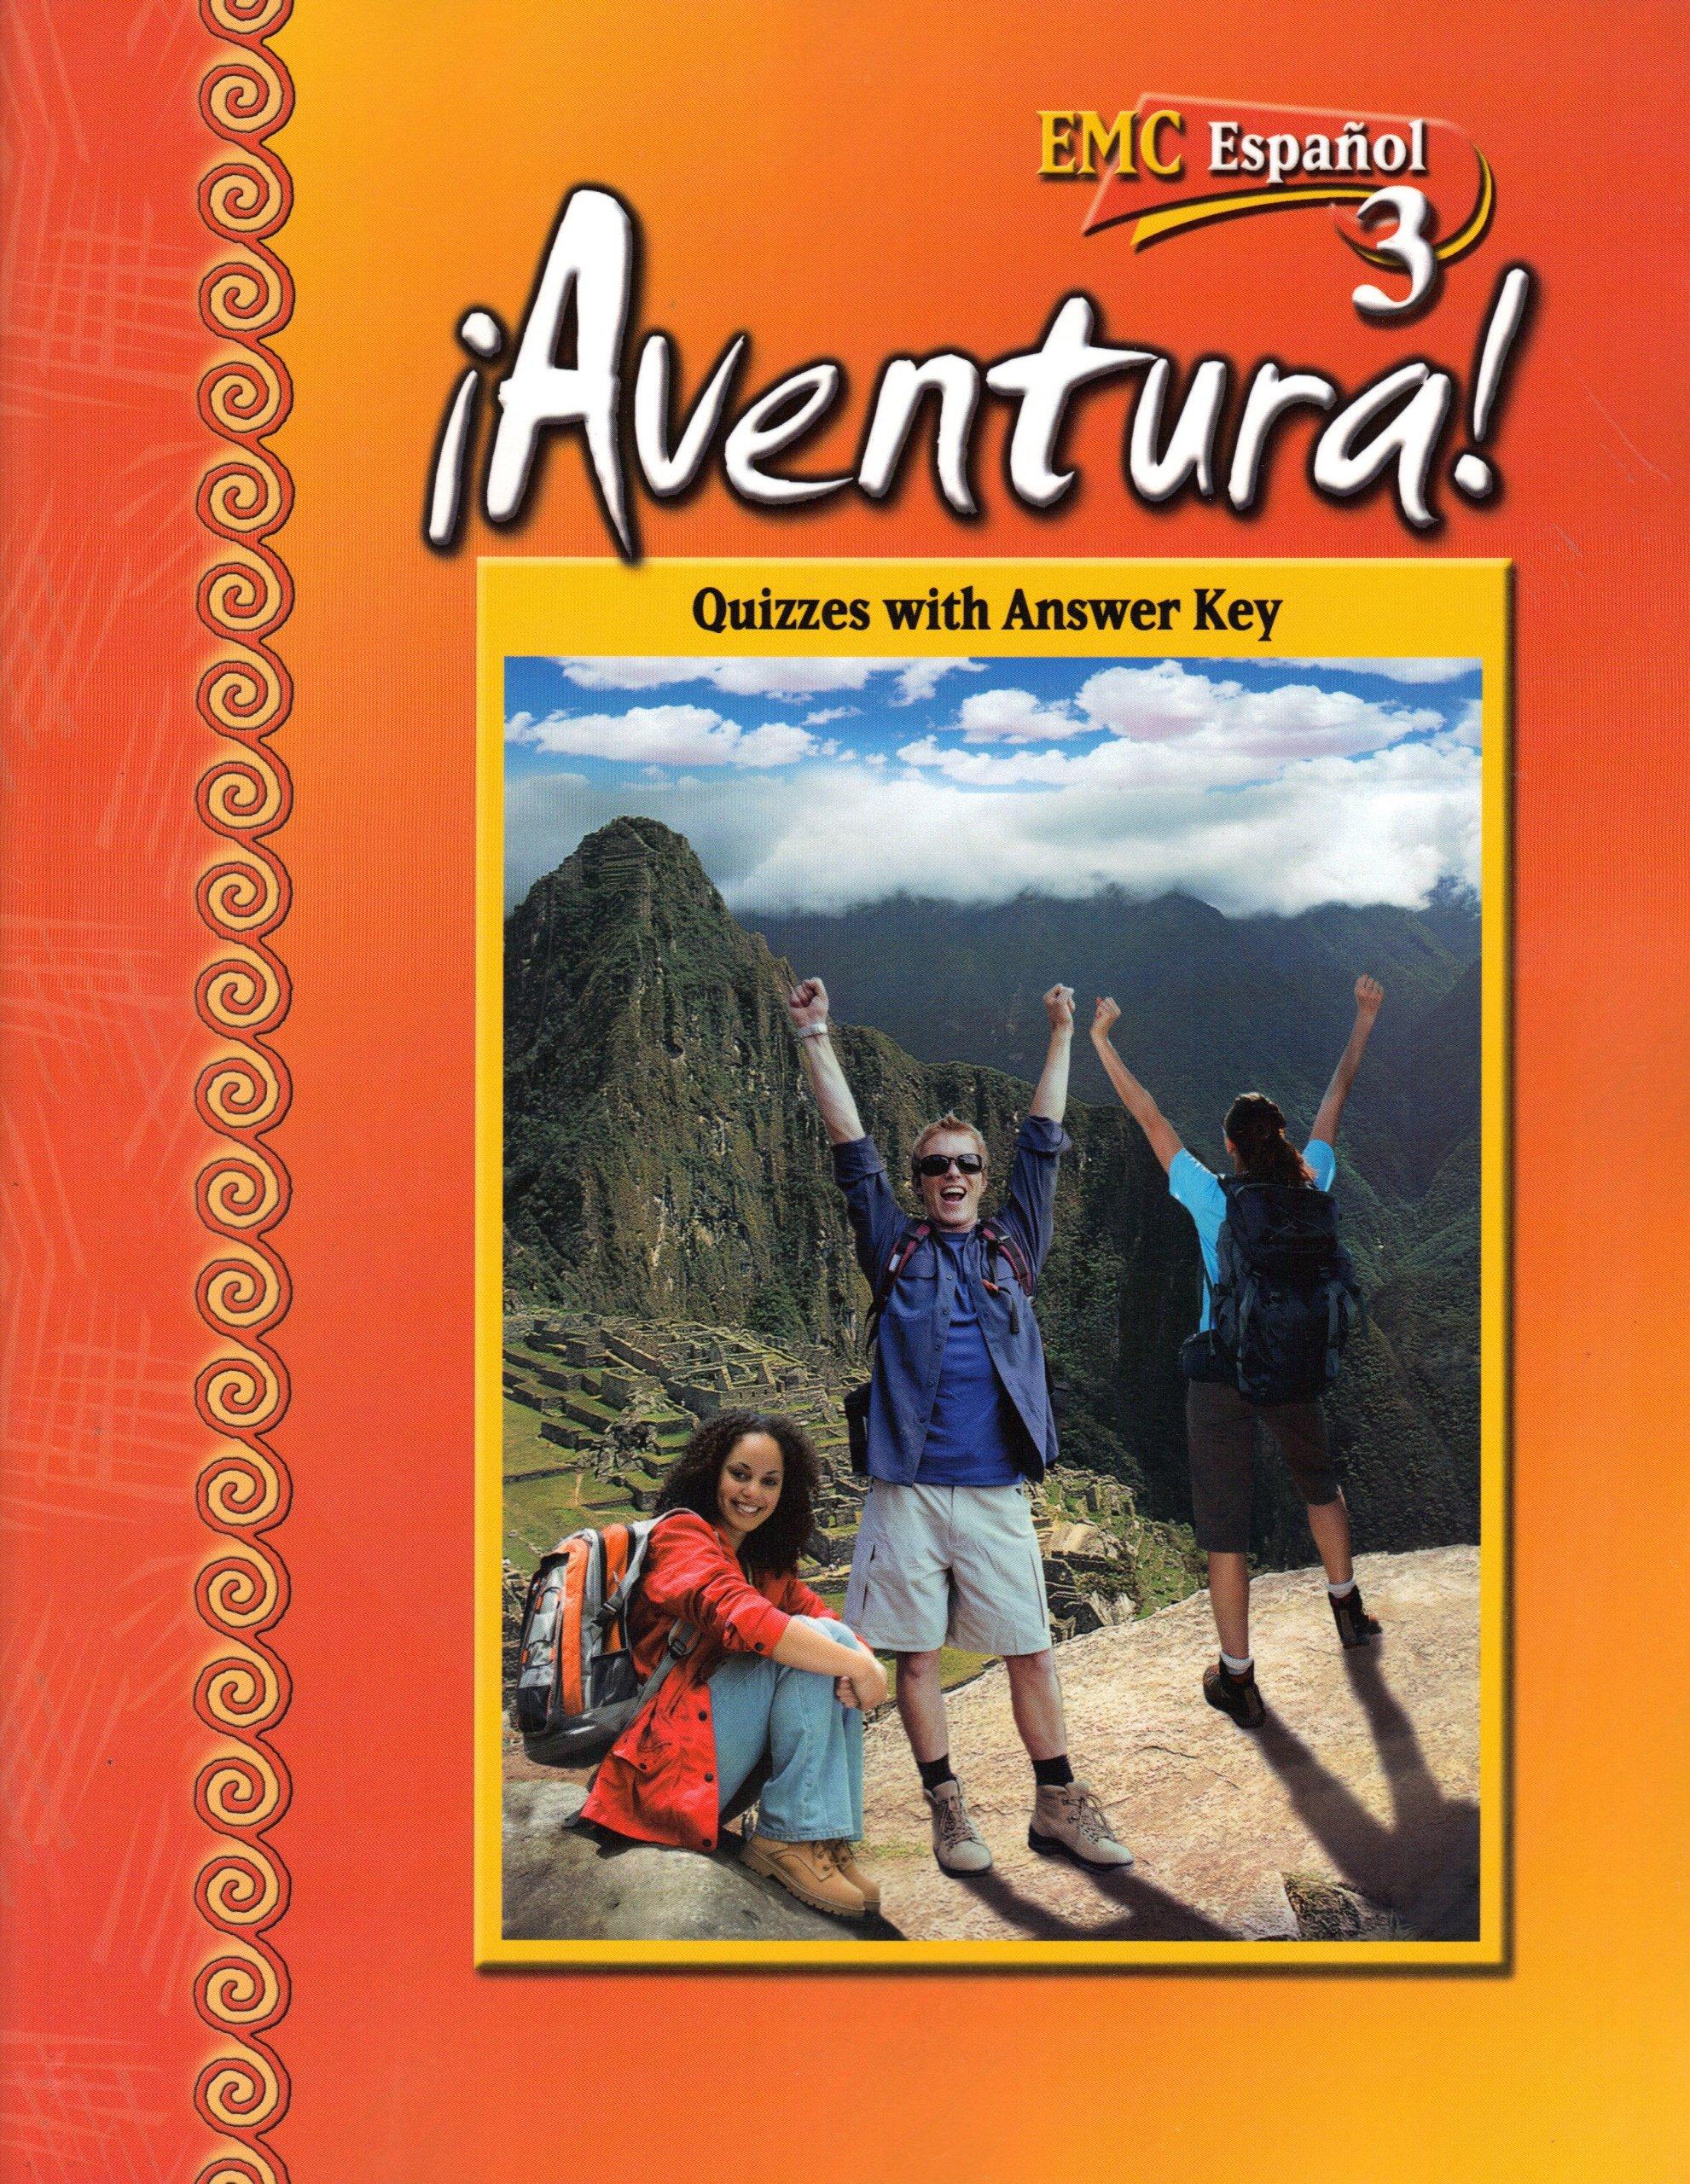 Aventura 3 emc espanol quizzes with answer key amazon books fandeluxe Images